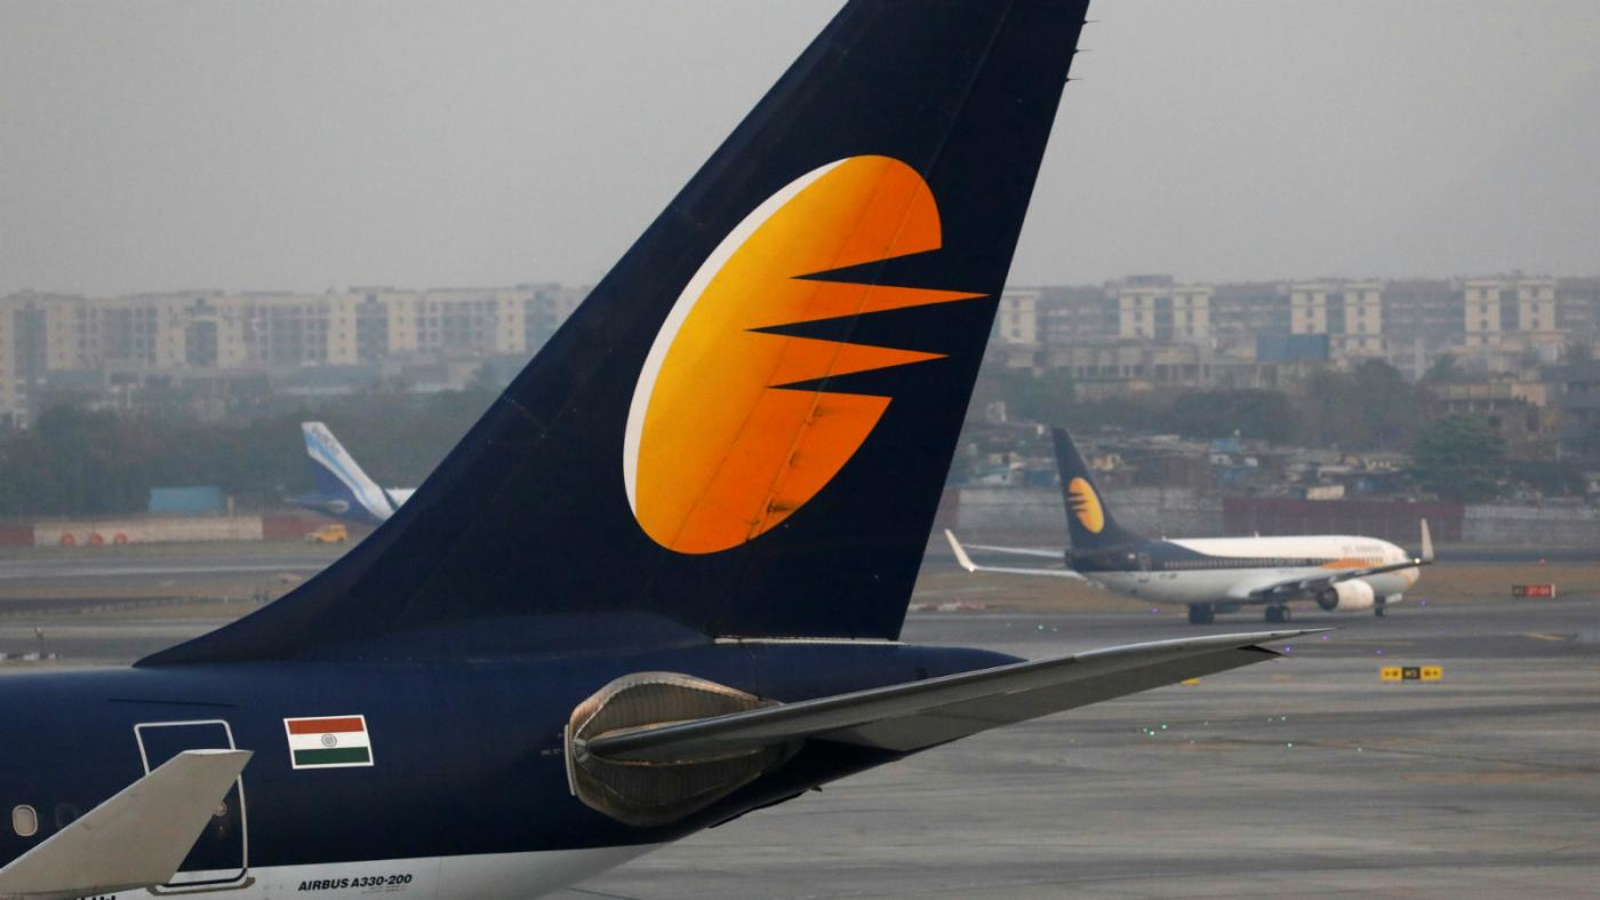 Nosebleeds, debt, and the taxman: Jet Airways just can't catch a break